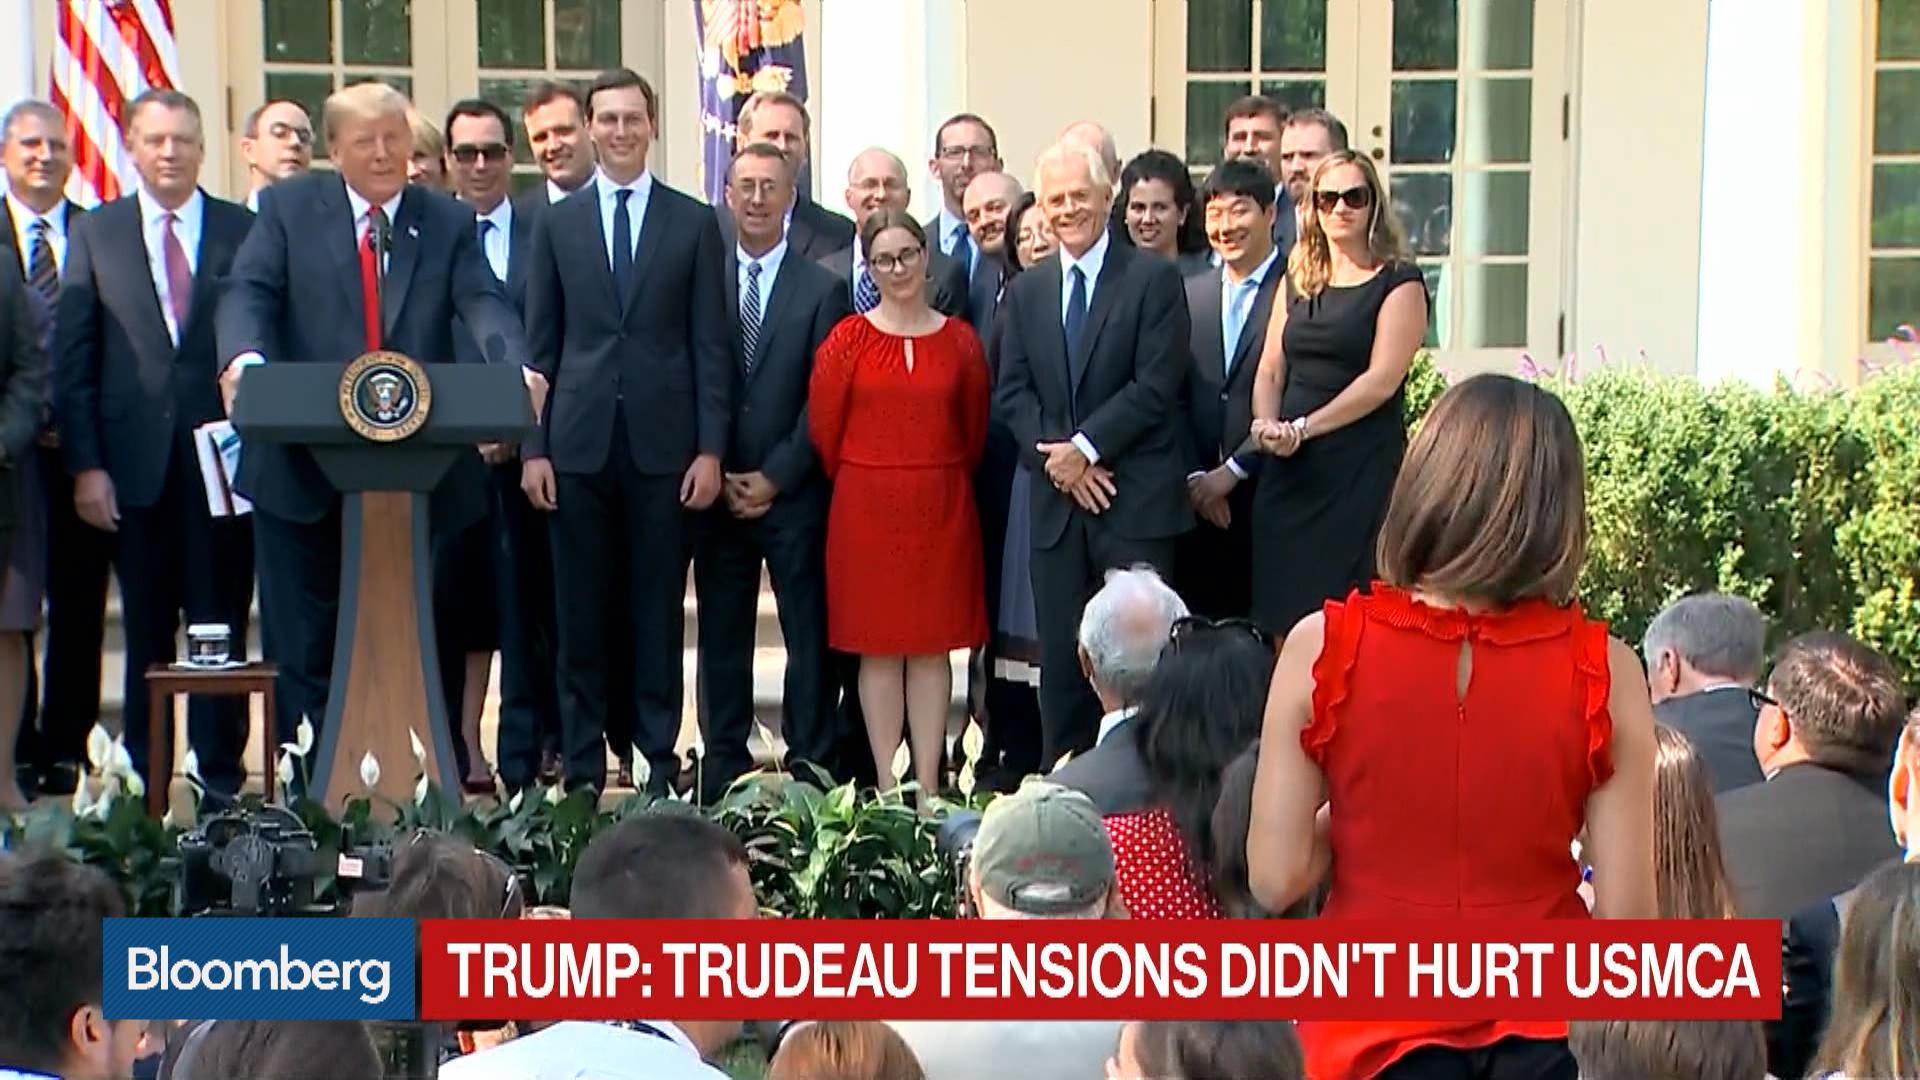 Trump Insults ABC Reporter Cecilia Vega: She 'Never' Thinks - Bloomberg